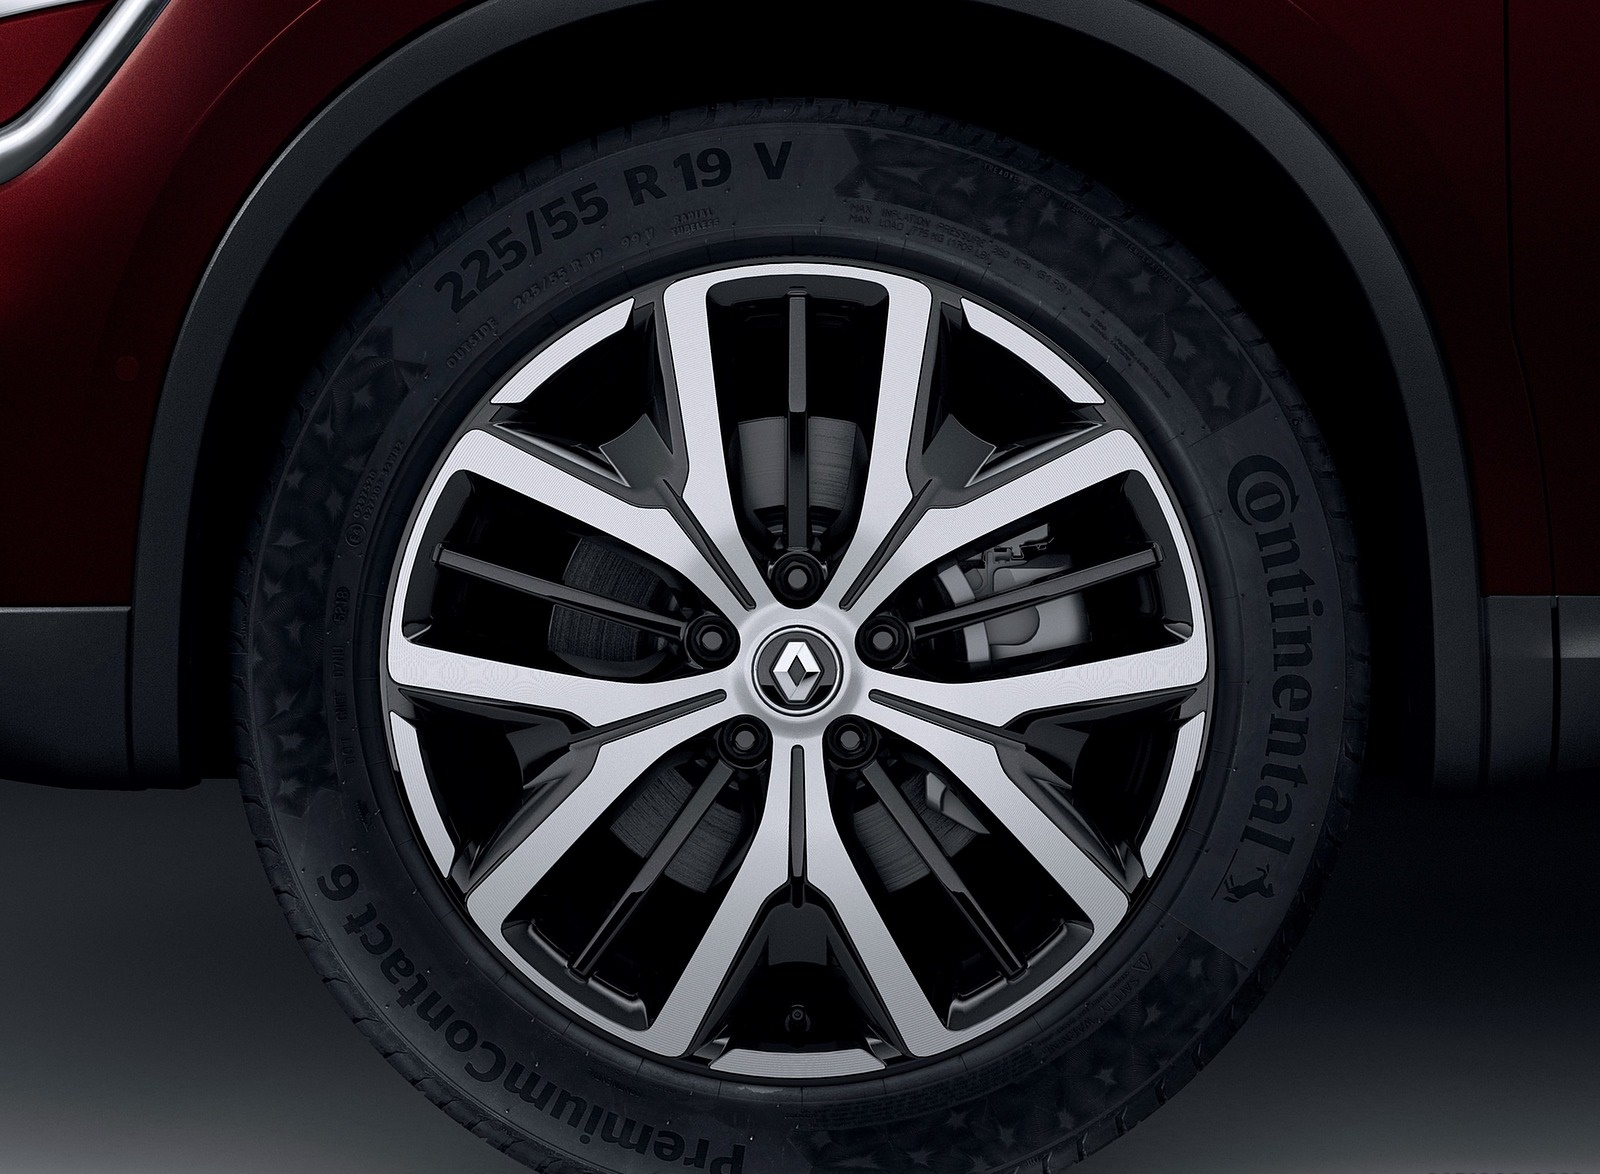 2020 Renault Koleos Wheel Wallpapers (7)